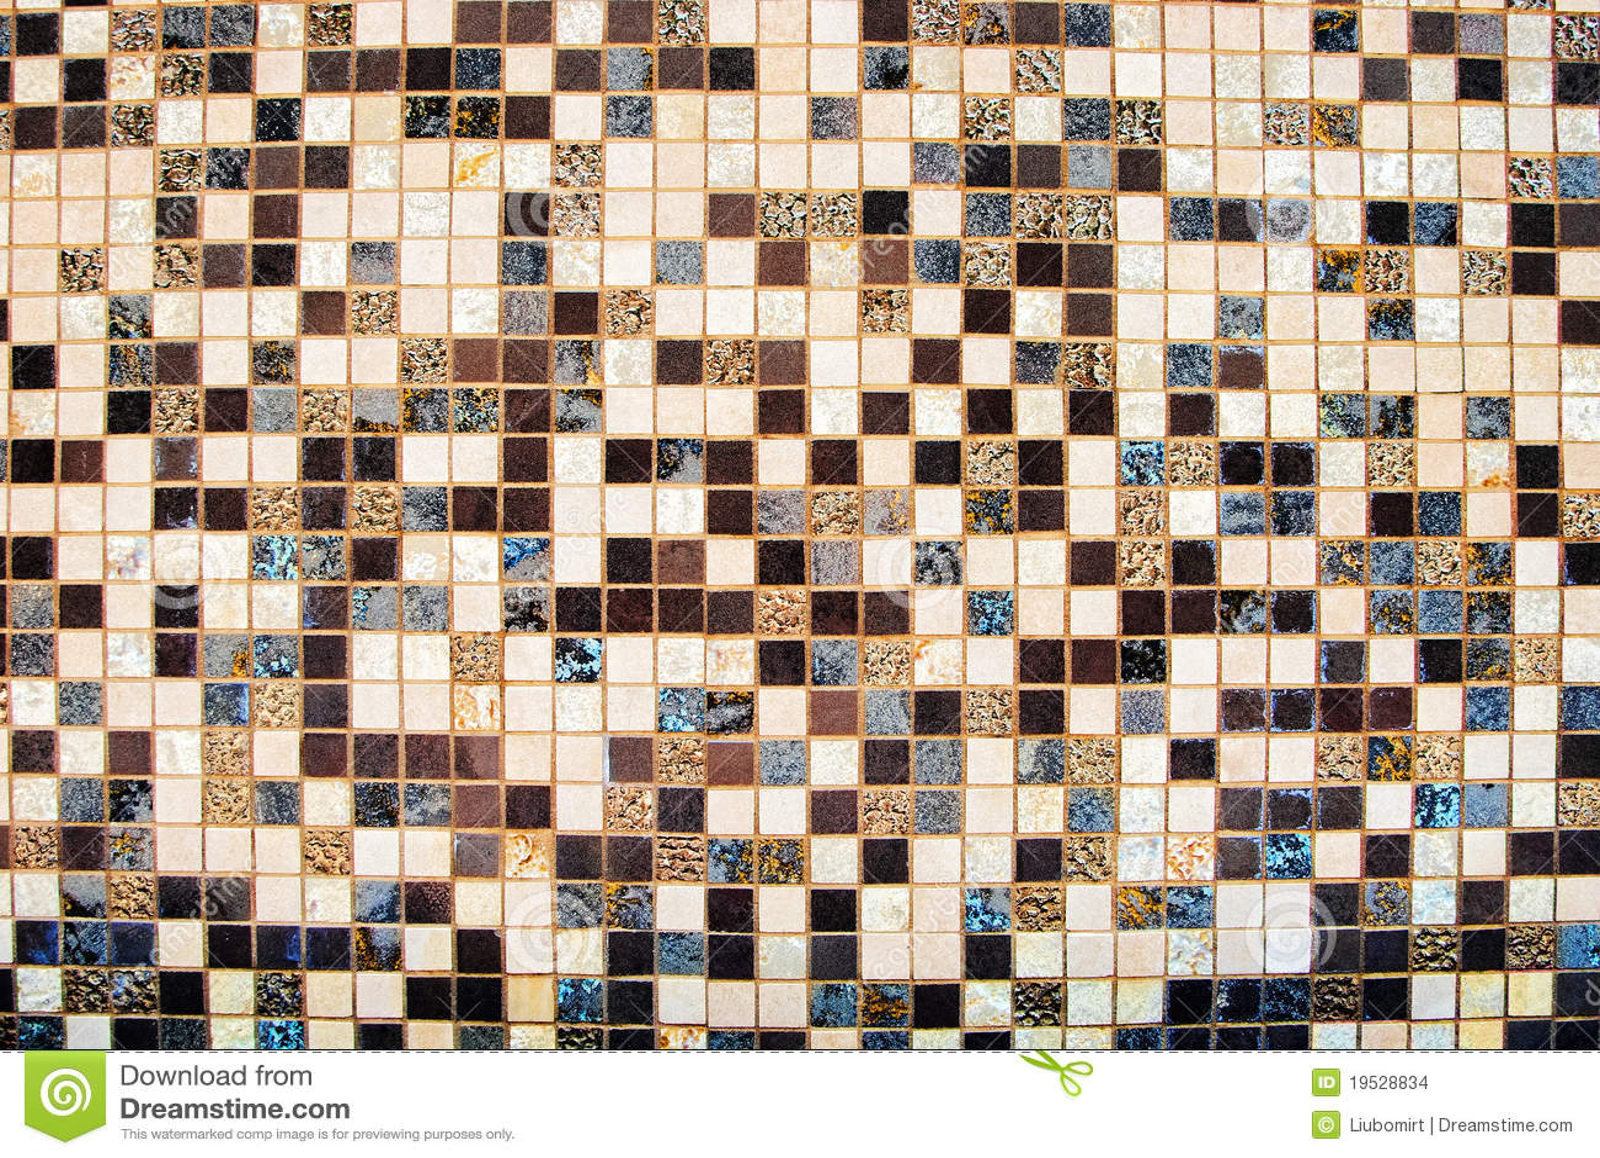 Ceramic tile stock photo. Image of elegant, pastel, flooring - 19528834